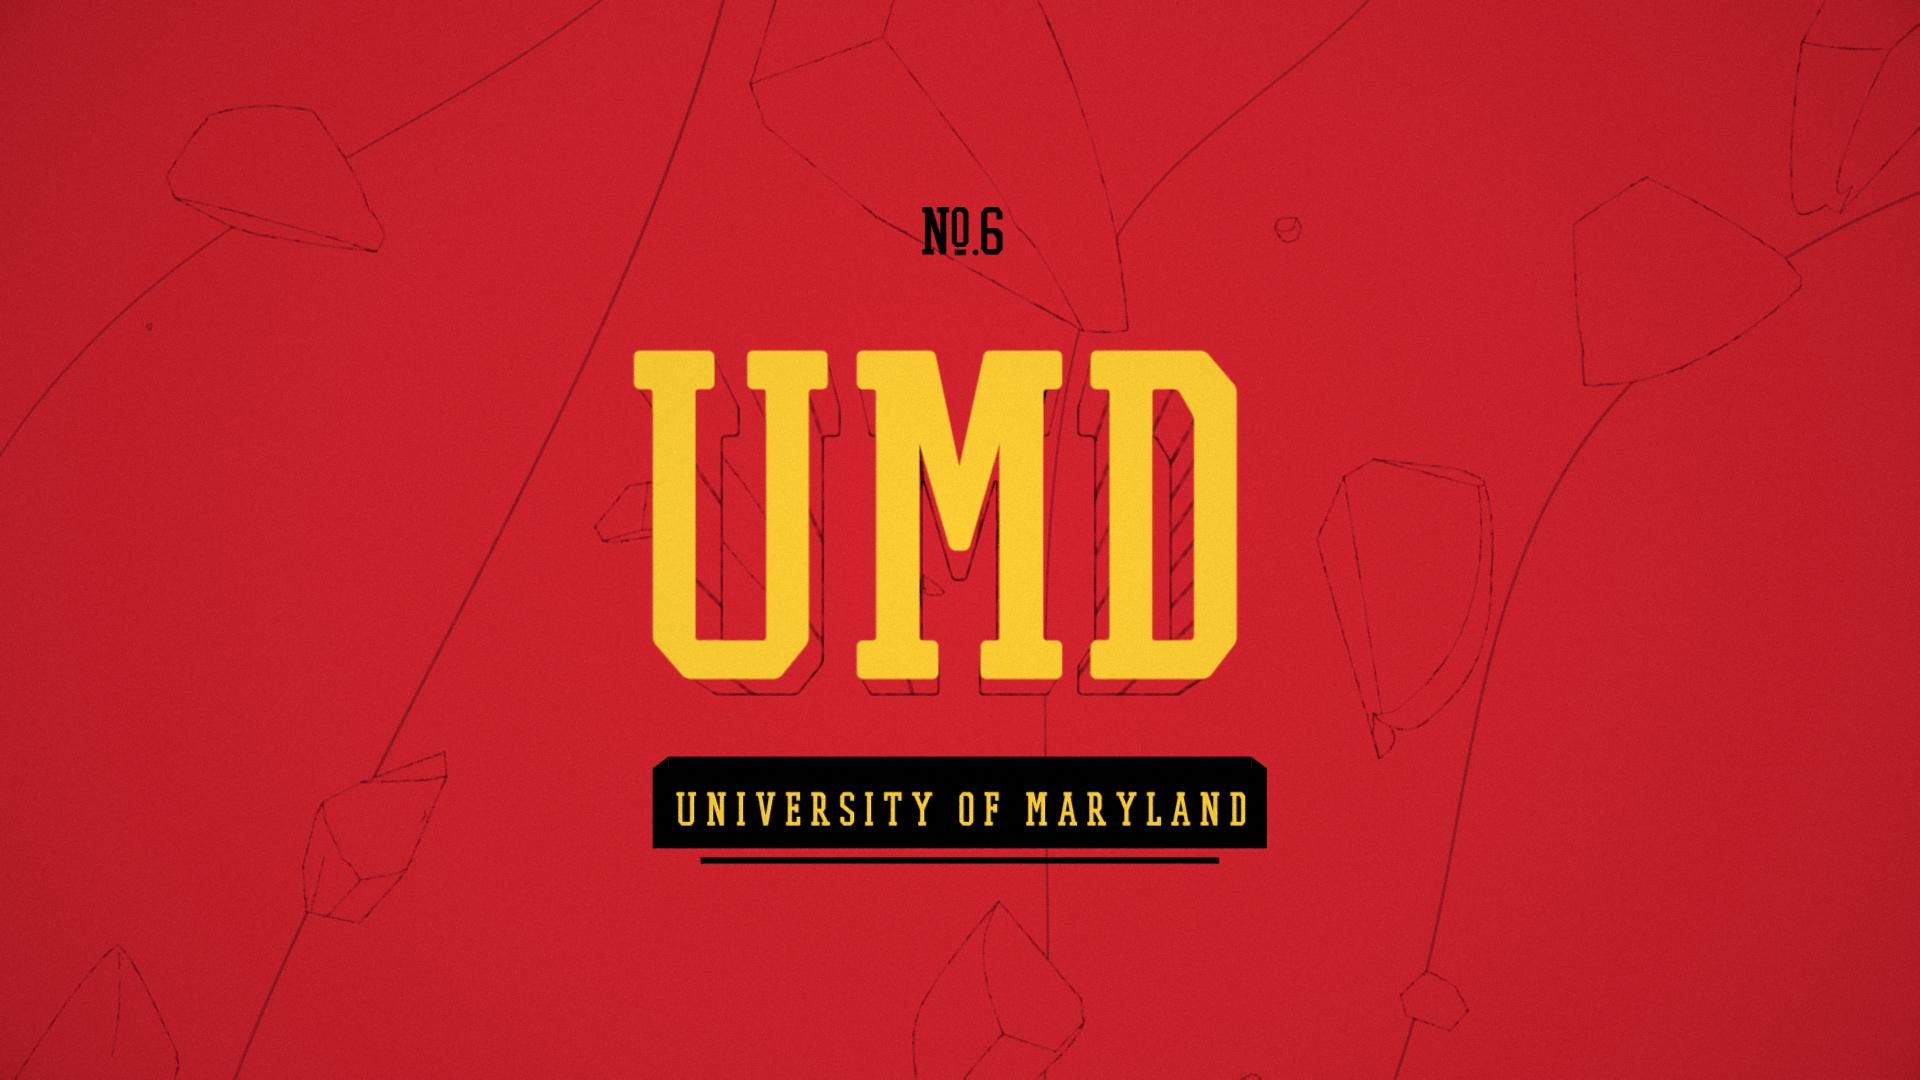 UMD_Letters.jpg